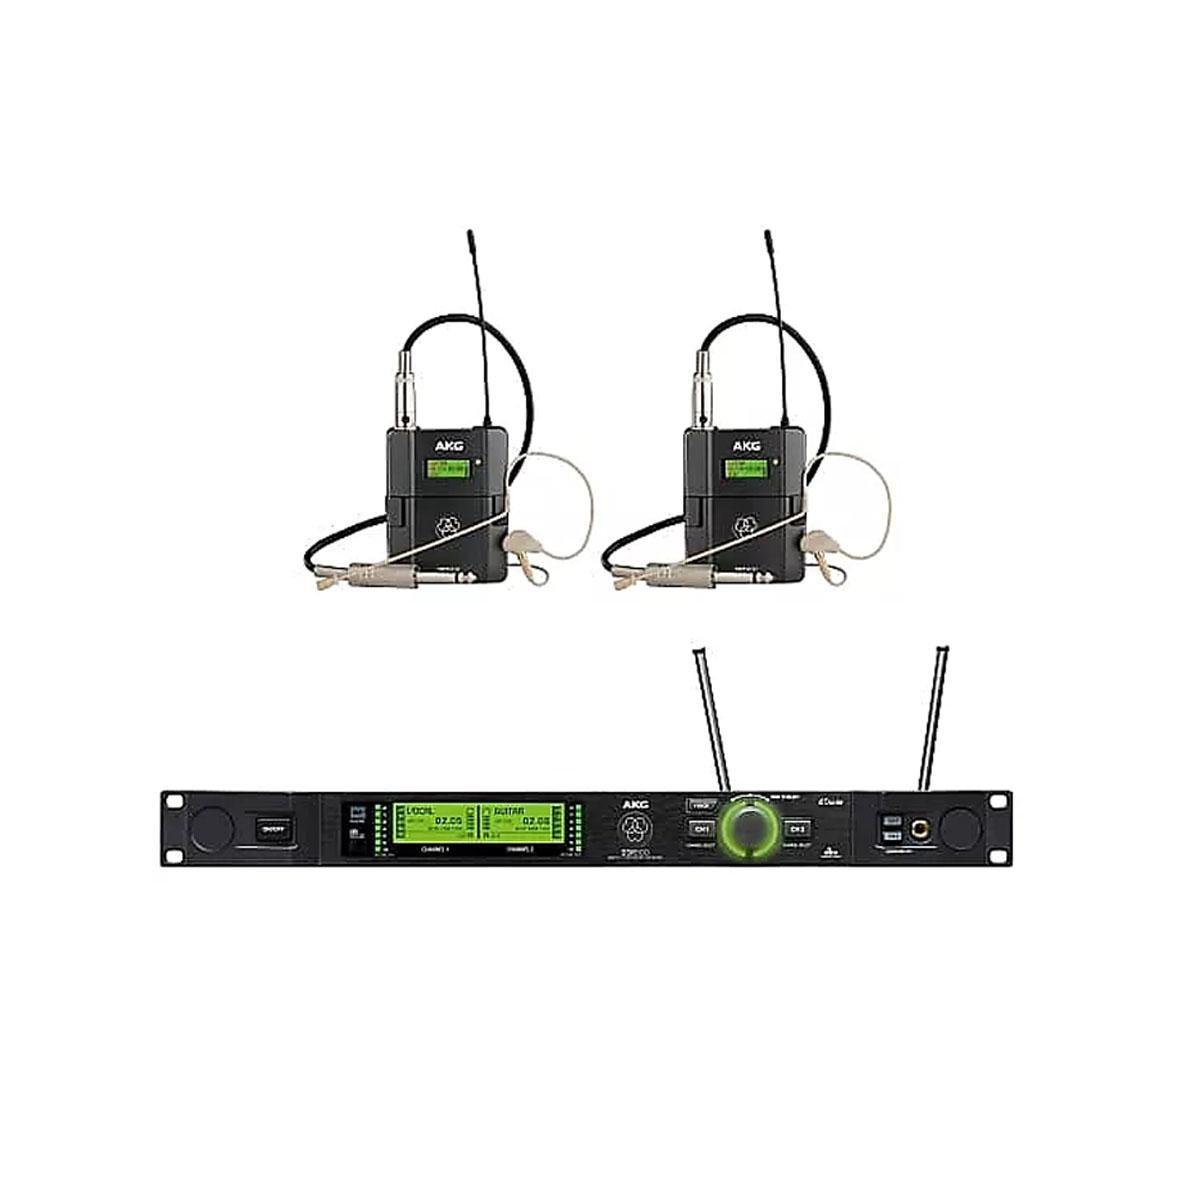 AKG DMS800 BD1 Performer Set Reference Digital Wireless Microphone System